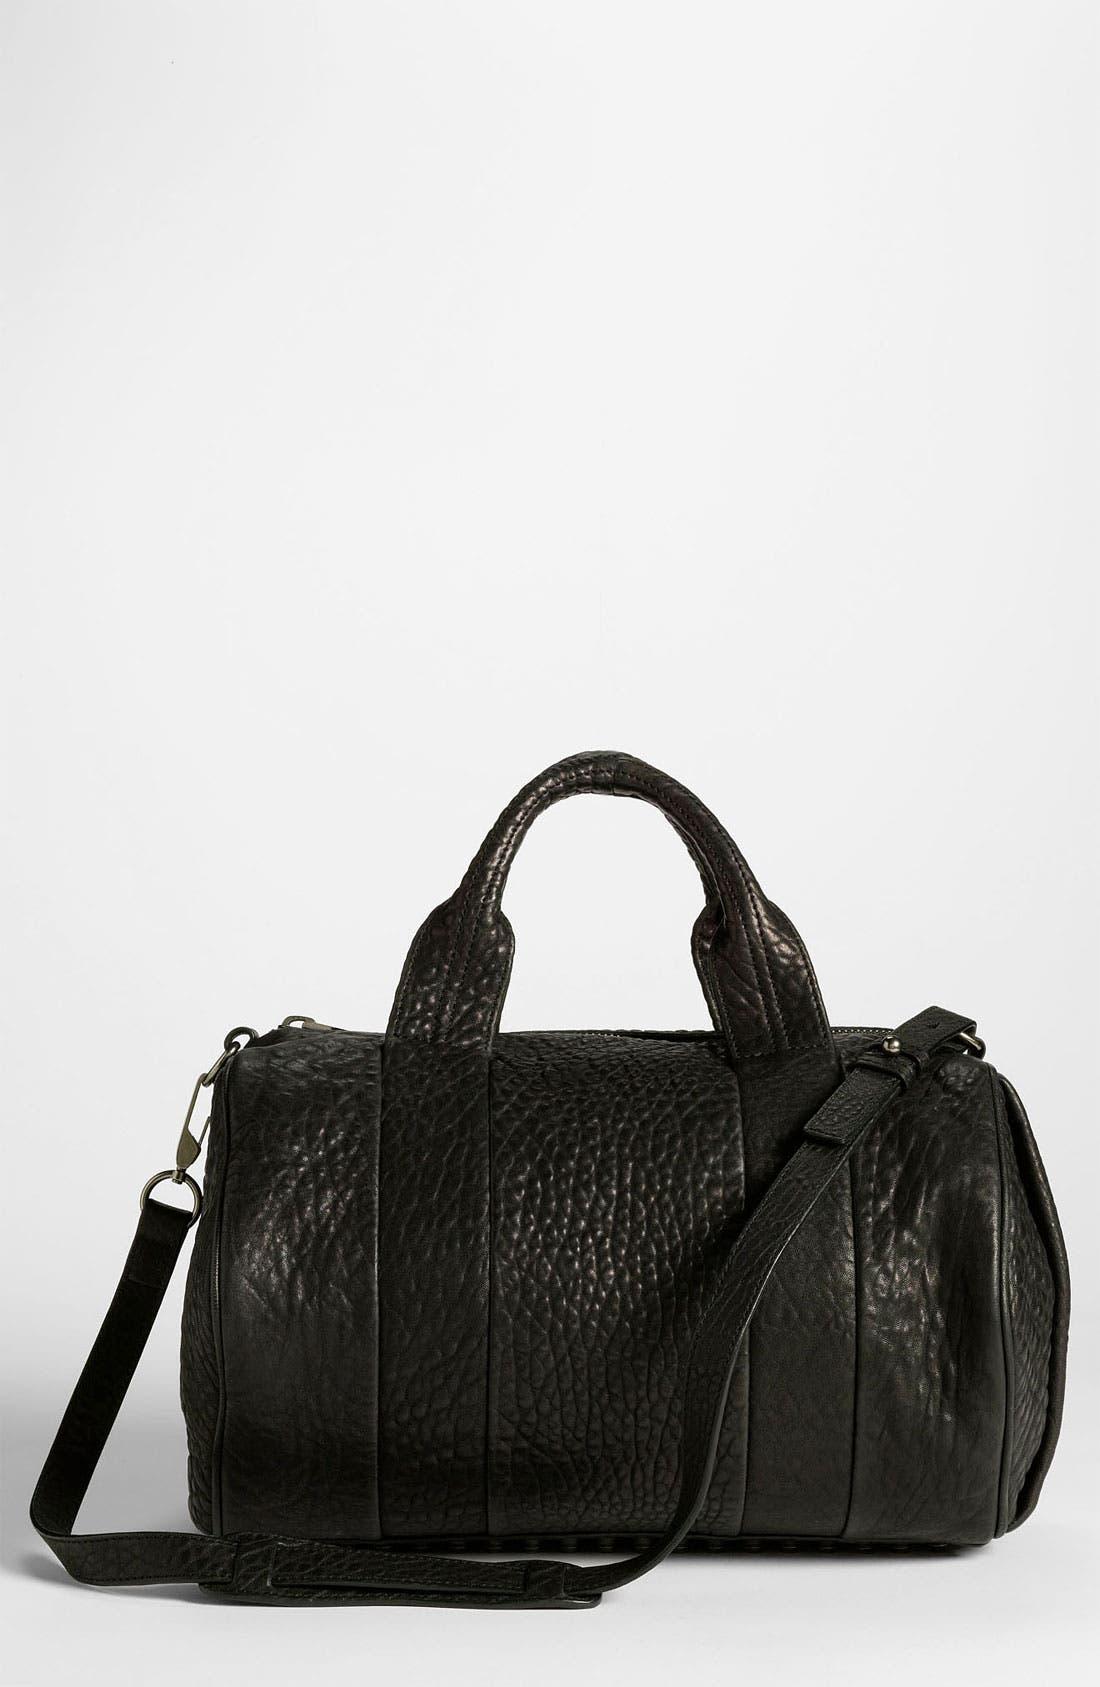 Main Image - Alexander Wang 'Rocco - Black Nickel' Leather Satchel